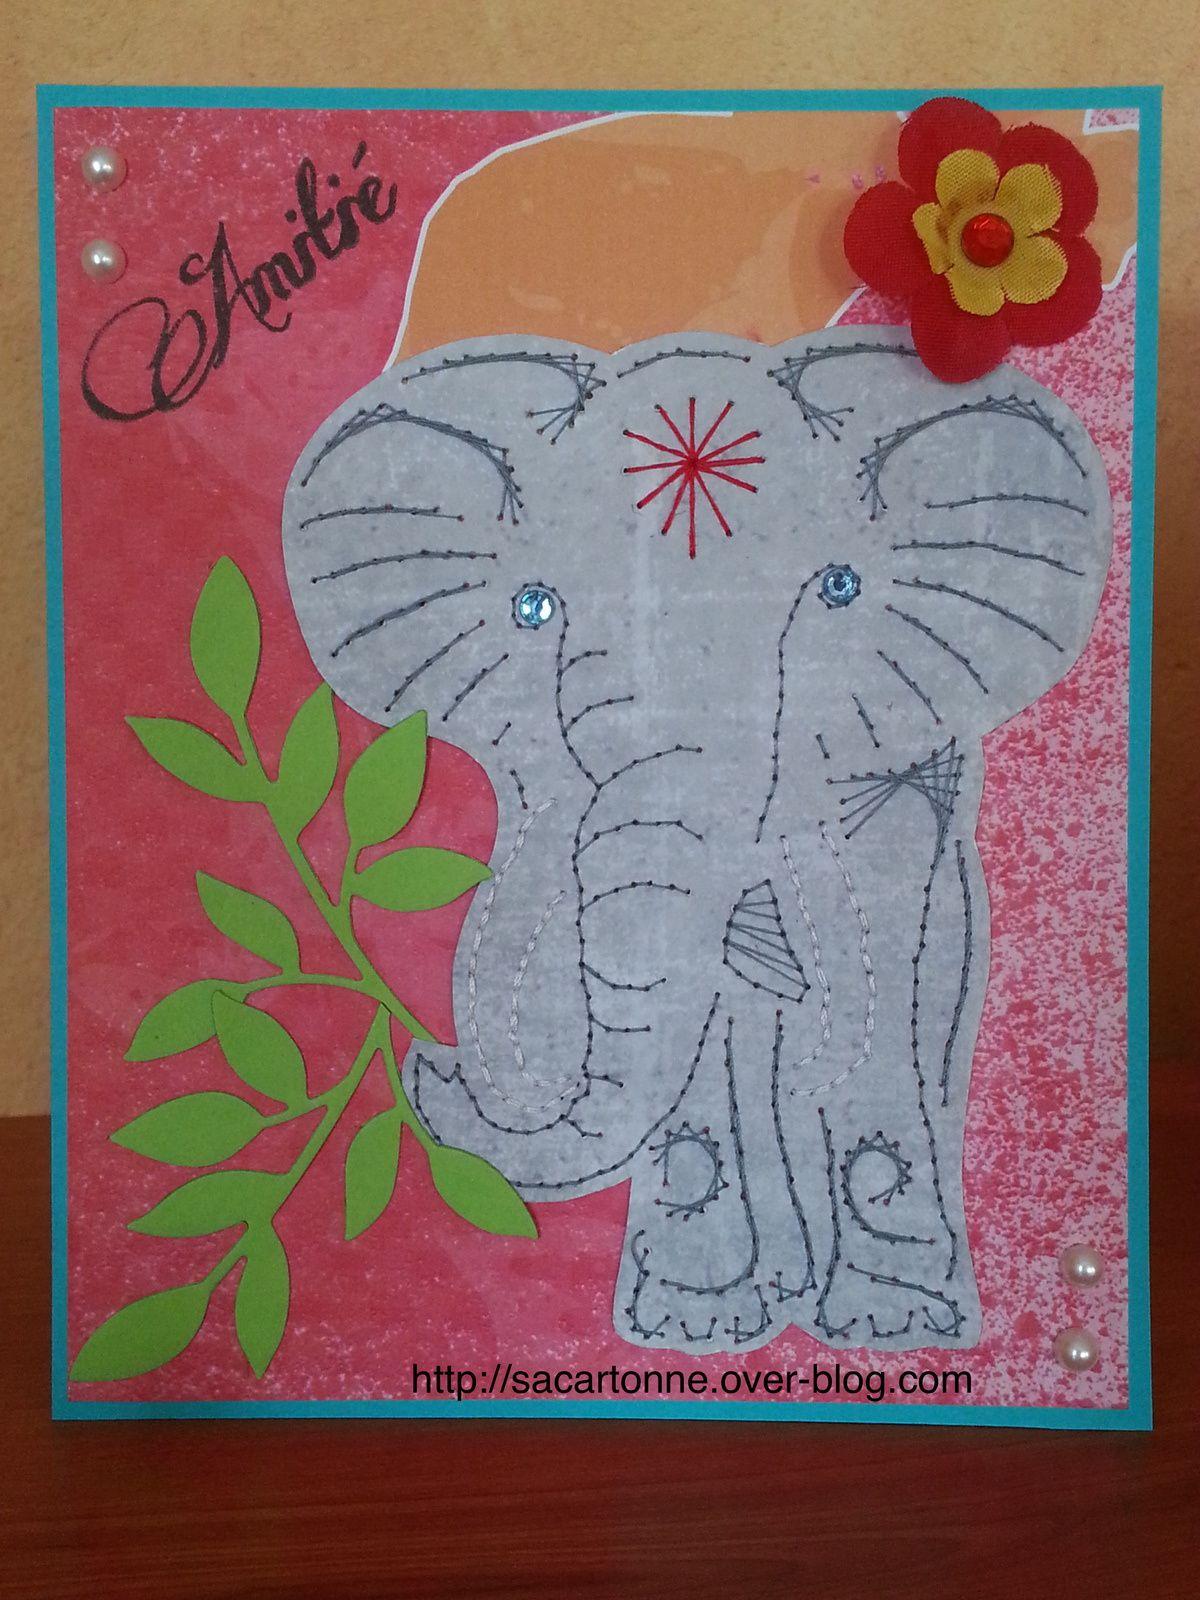 SAL Elephant